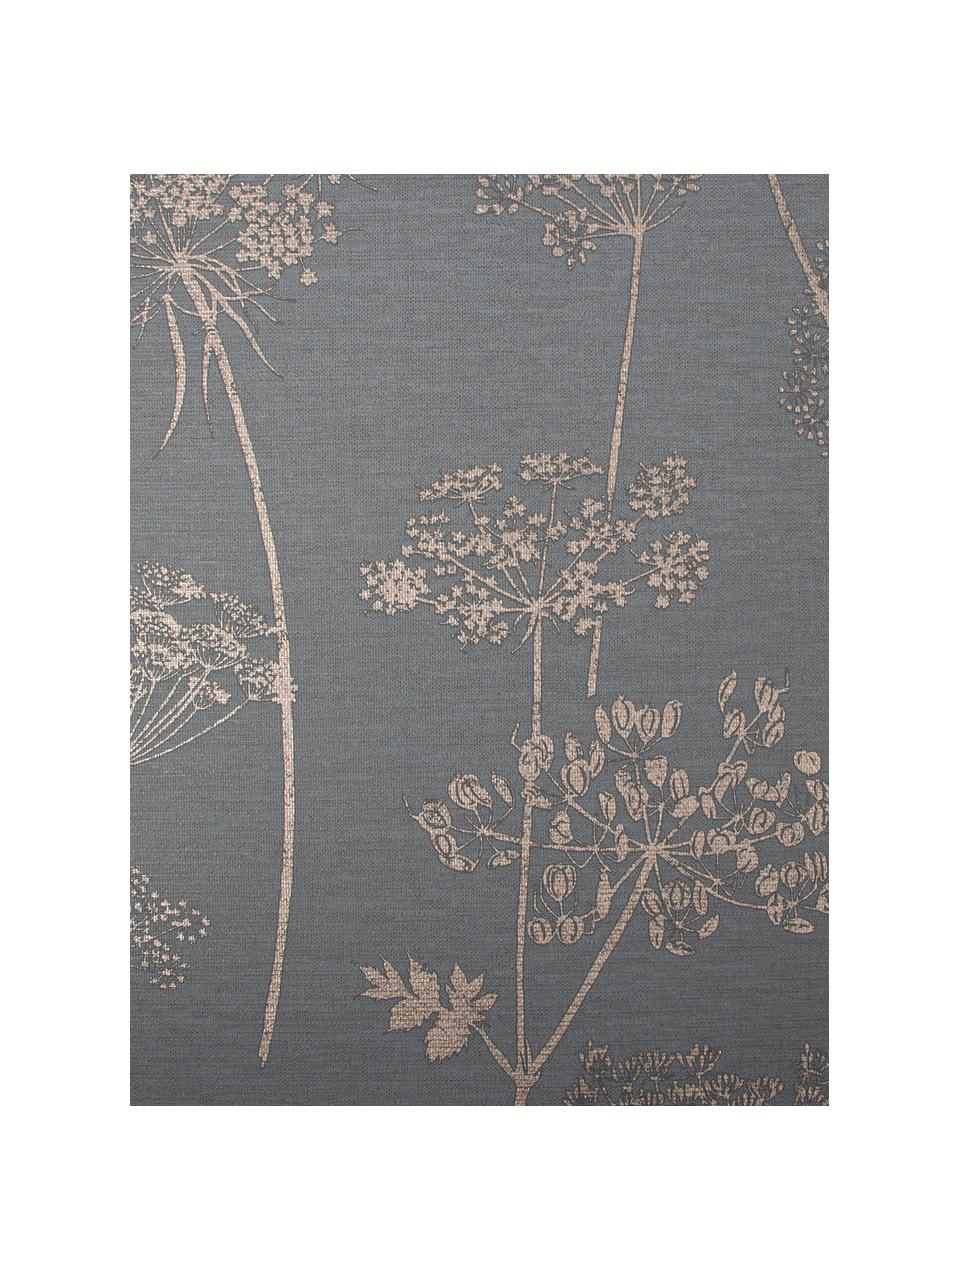 Carta da parati Stilistic Flower, Tessuto non tessuto, Grigio, beige, Larg. 52 x Alt. 1005 cm